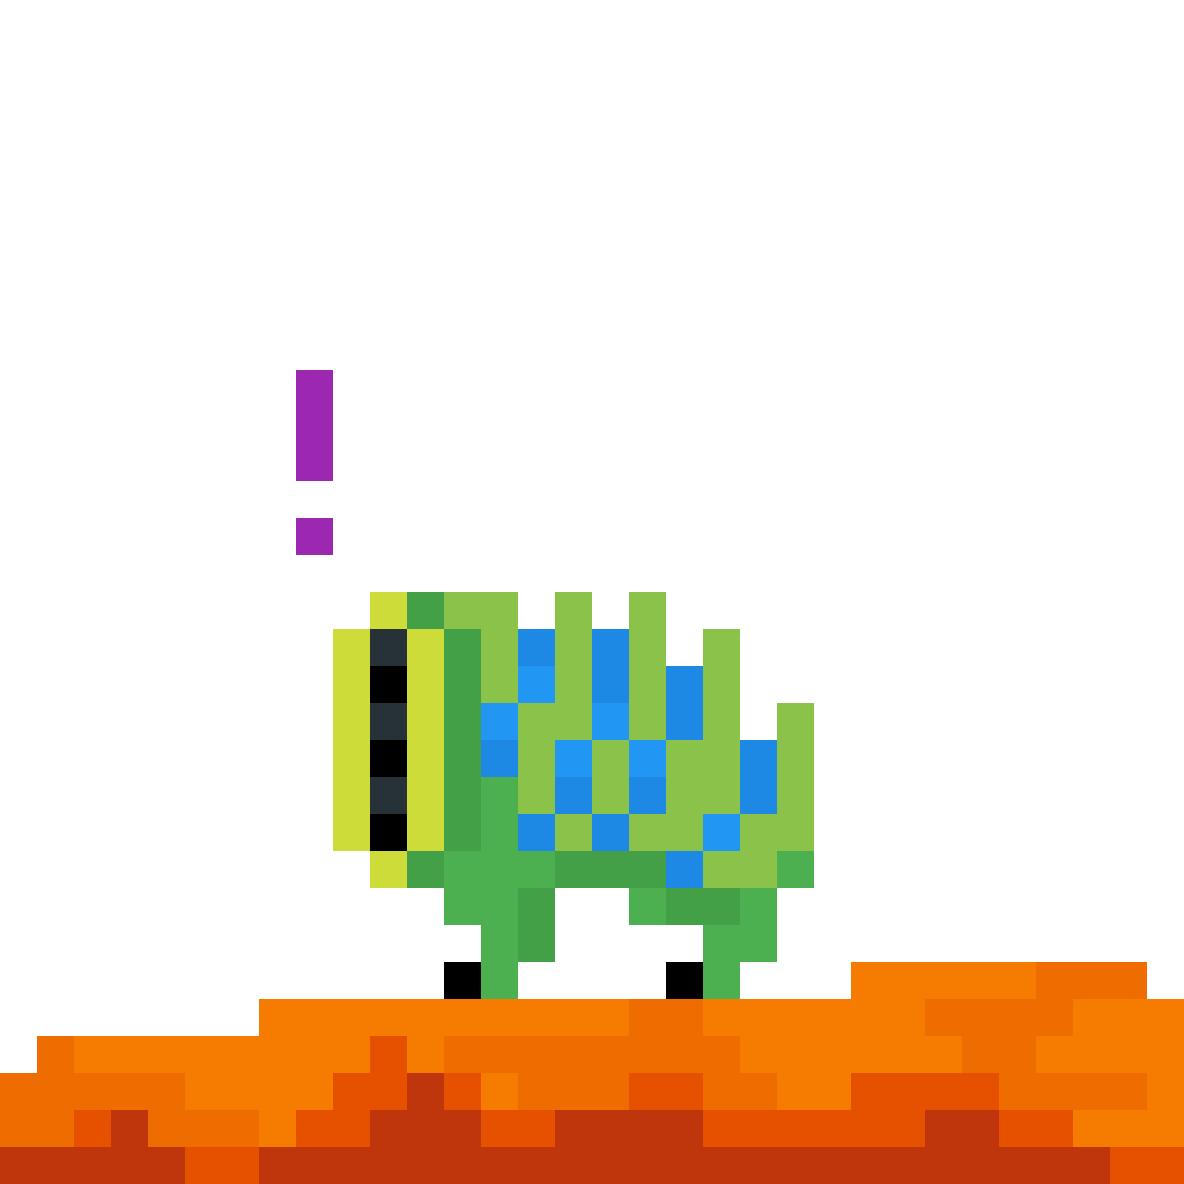 pixel houndeye! by roboboredom